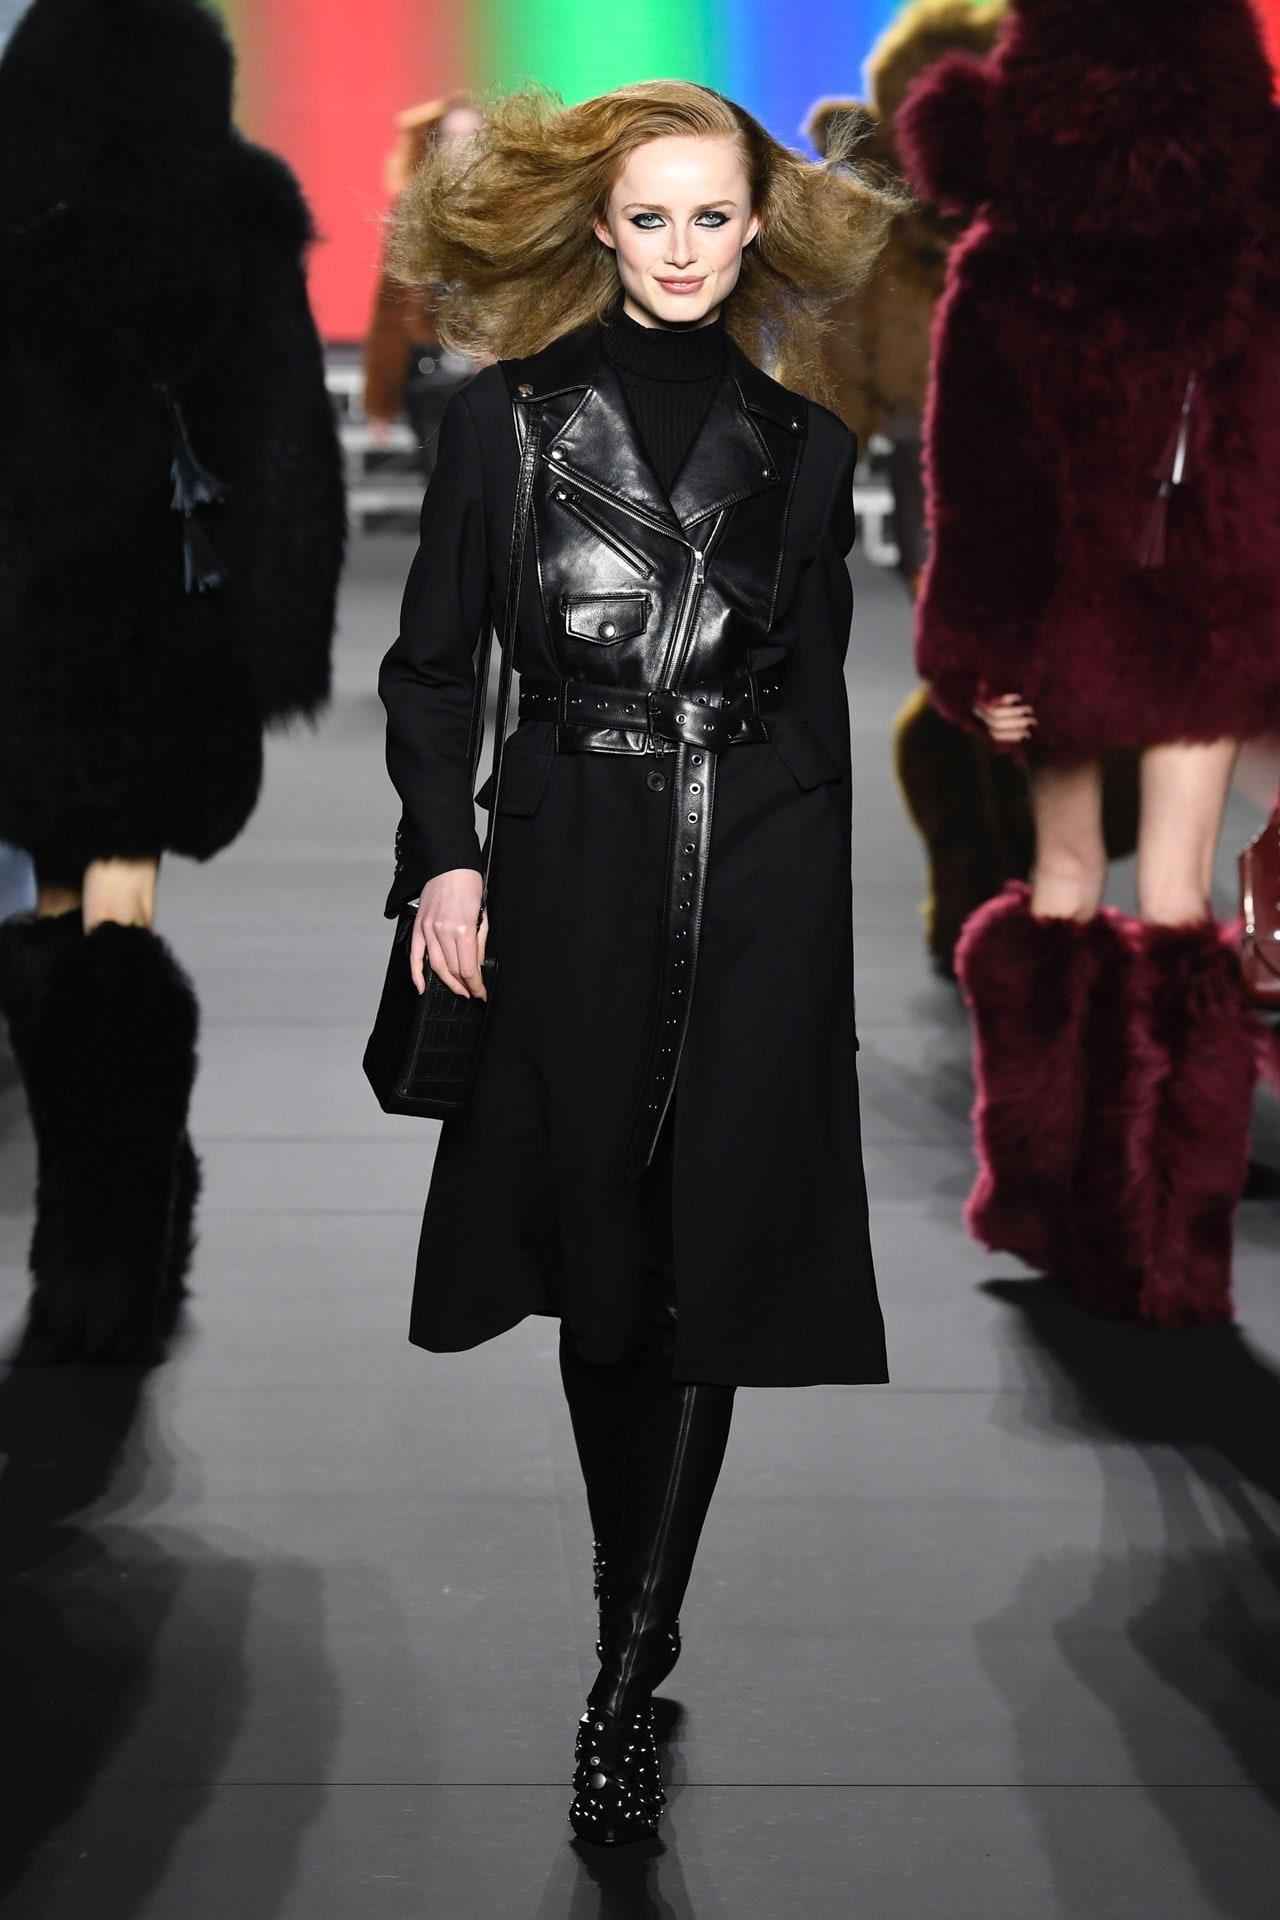 Sonia Rykiel ready-to-wear autumn/winter '18/'19